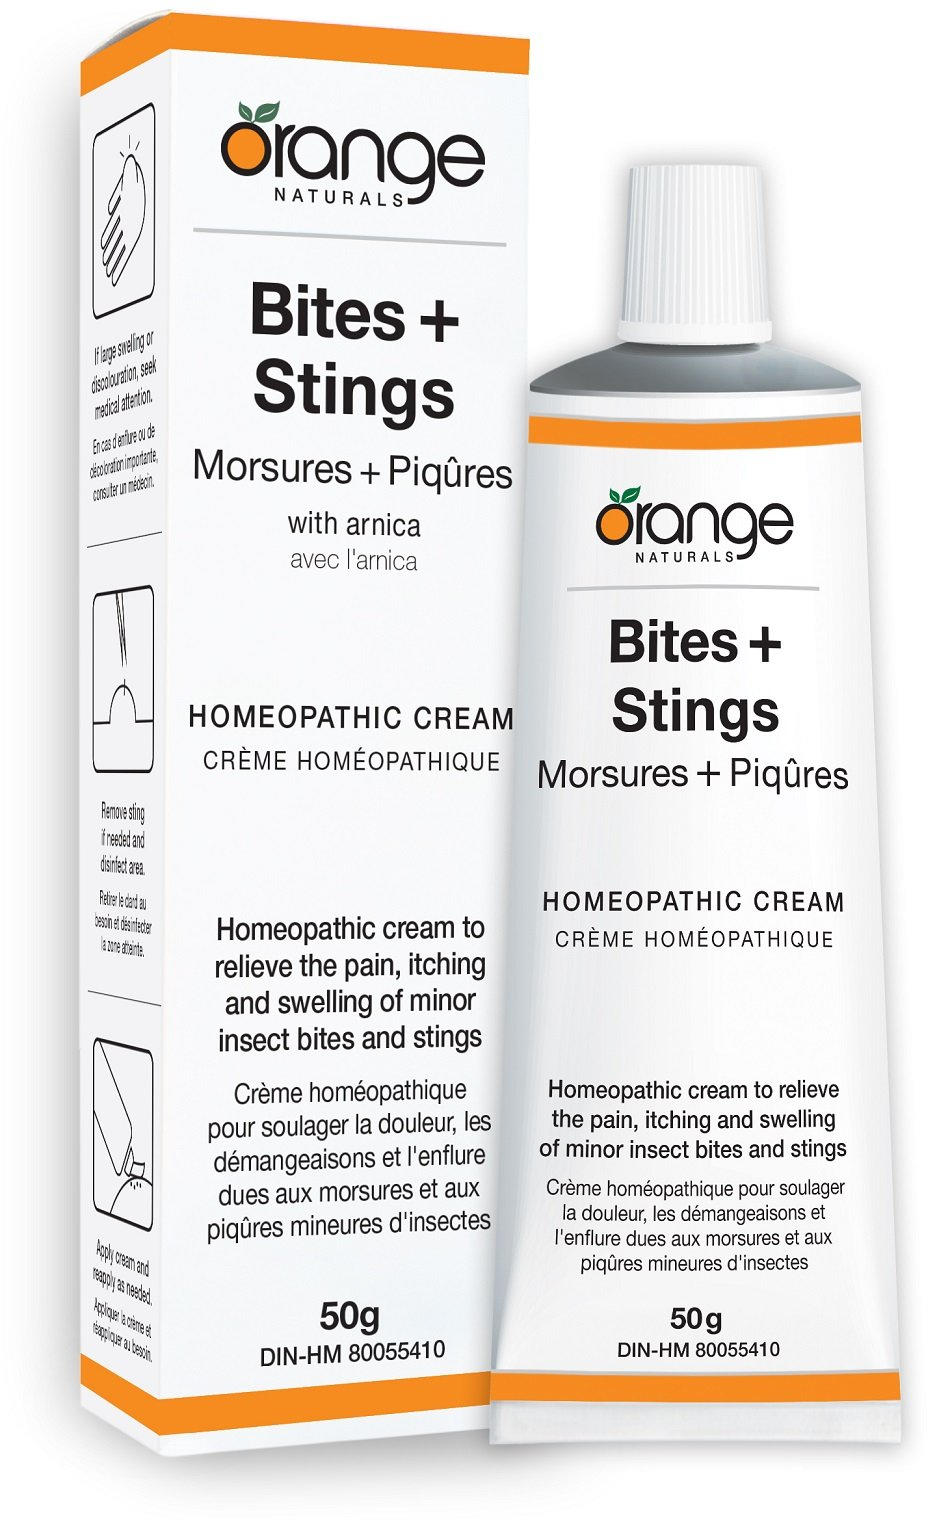 Orange Naturals Homeopathic Cream - Bites + Stings, 50 g